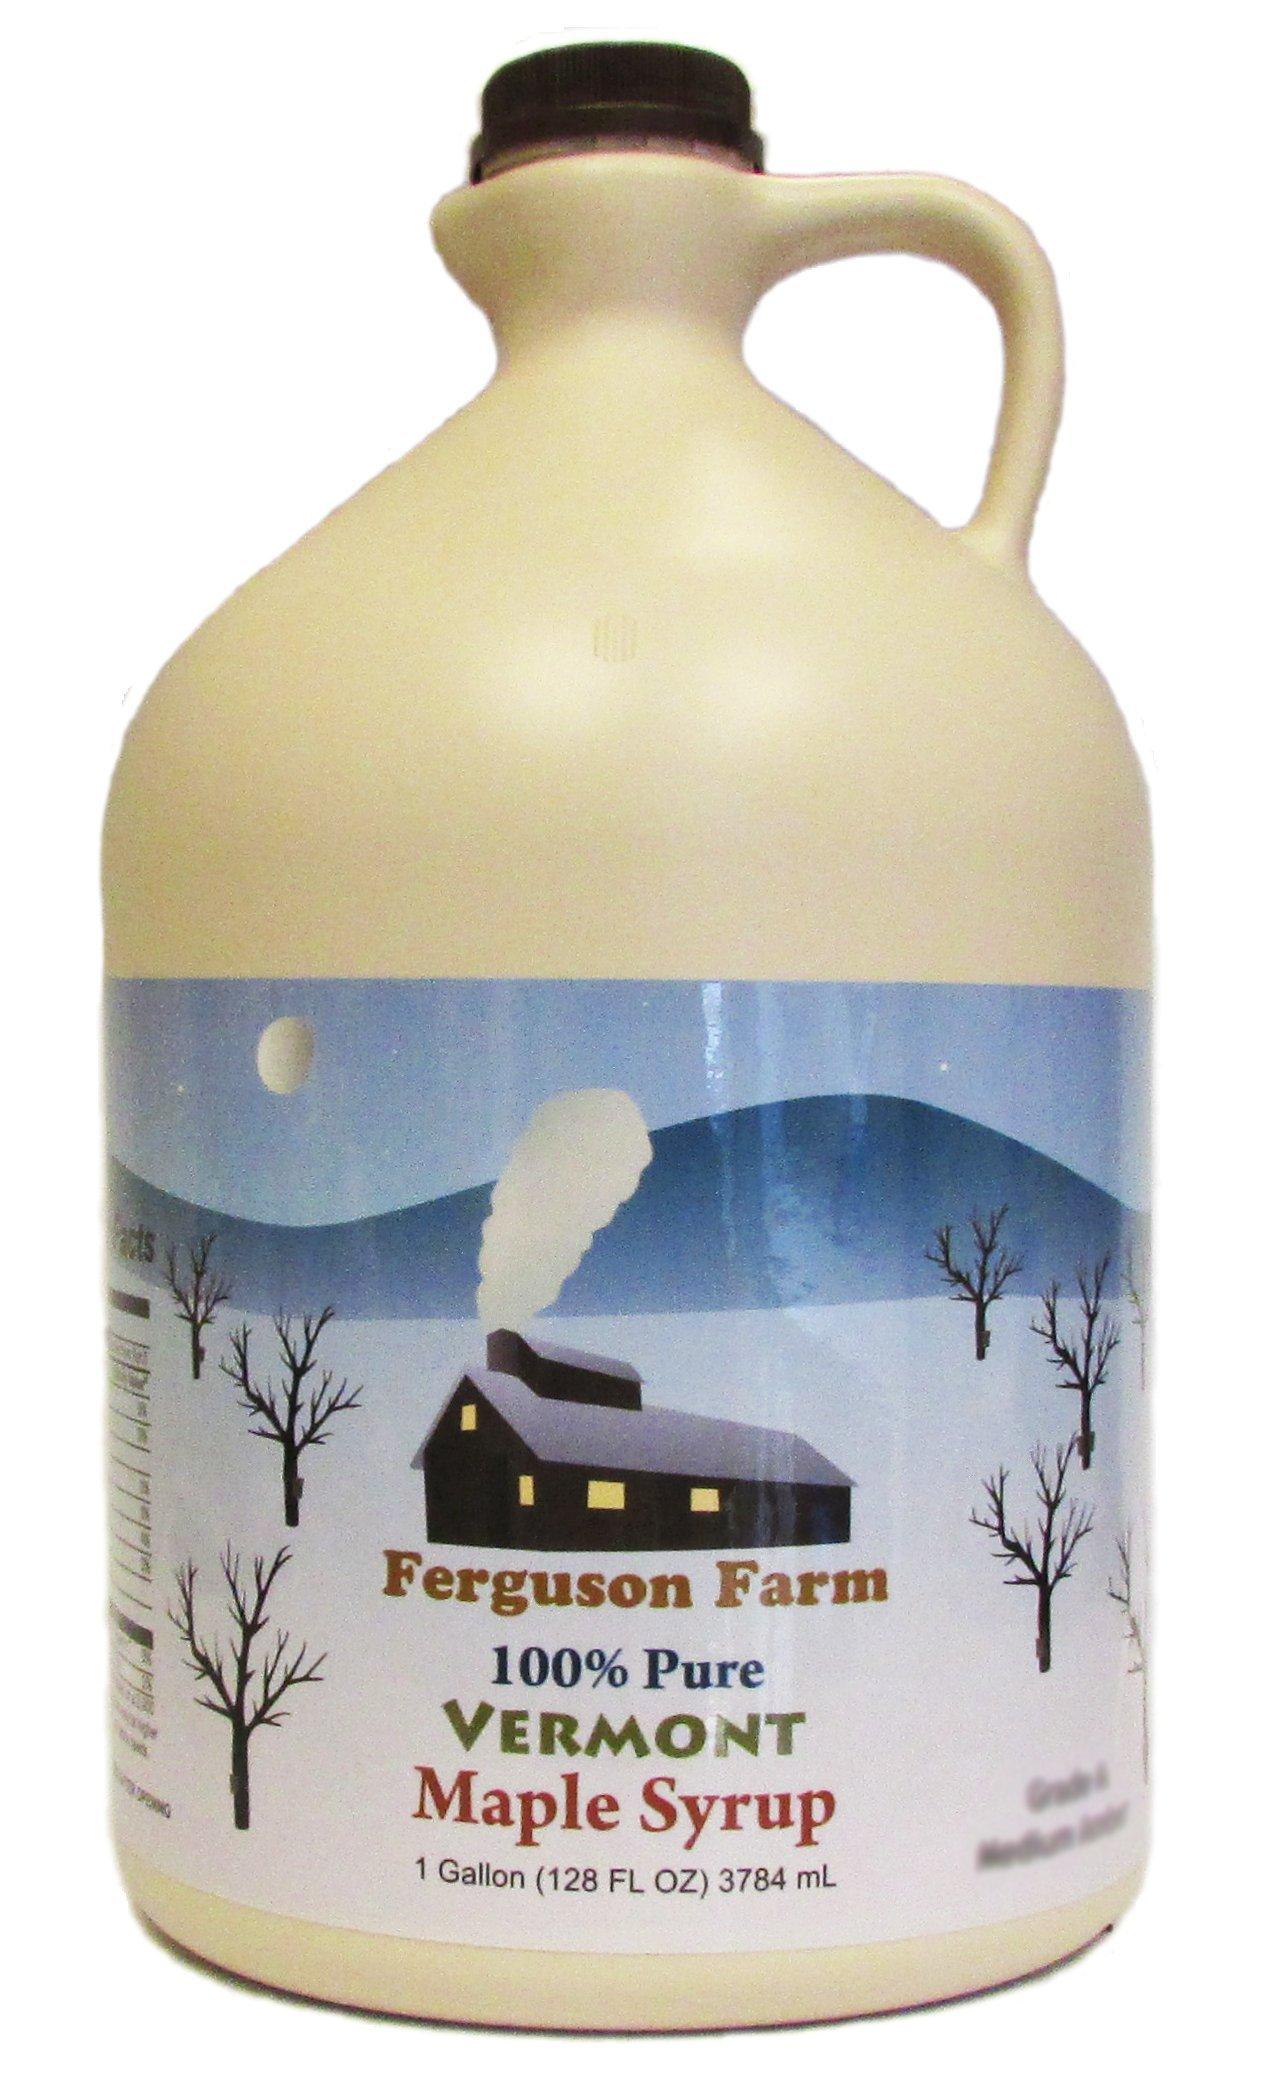 Ferguson Farms 100% Pure Vermont Maple Syrup, Grade B, Jug 1 Gallon (128oz)